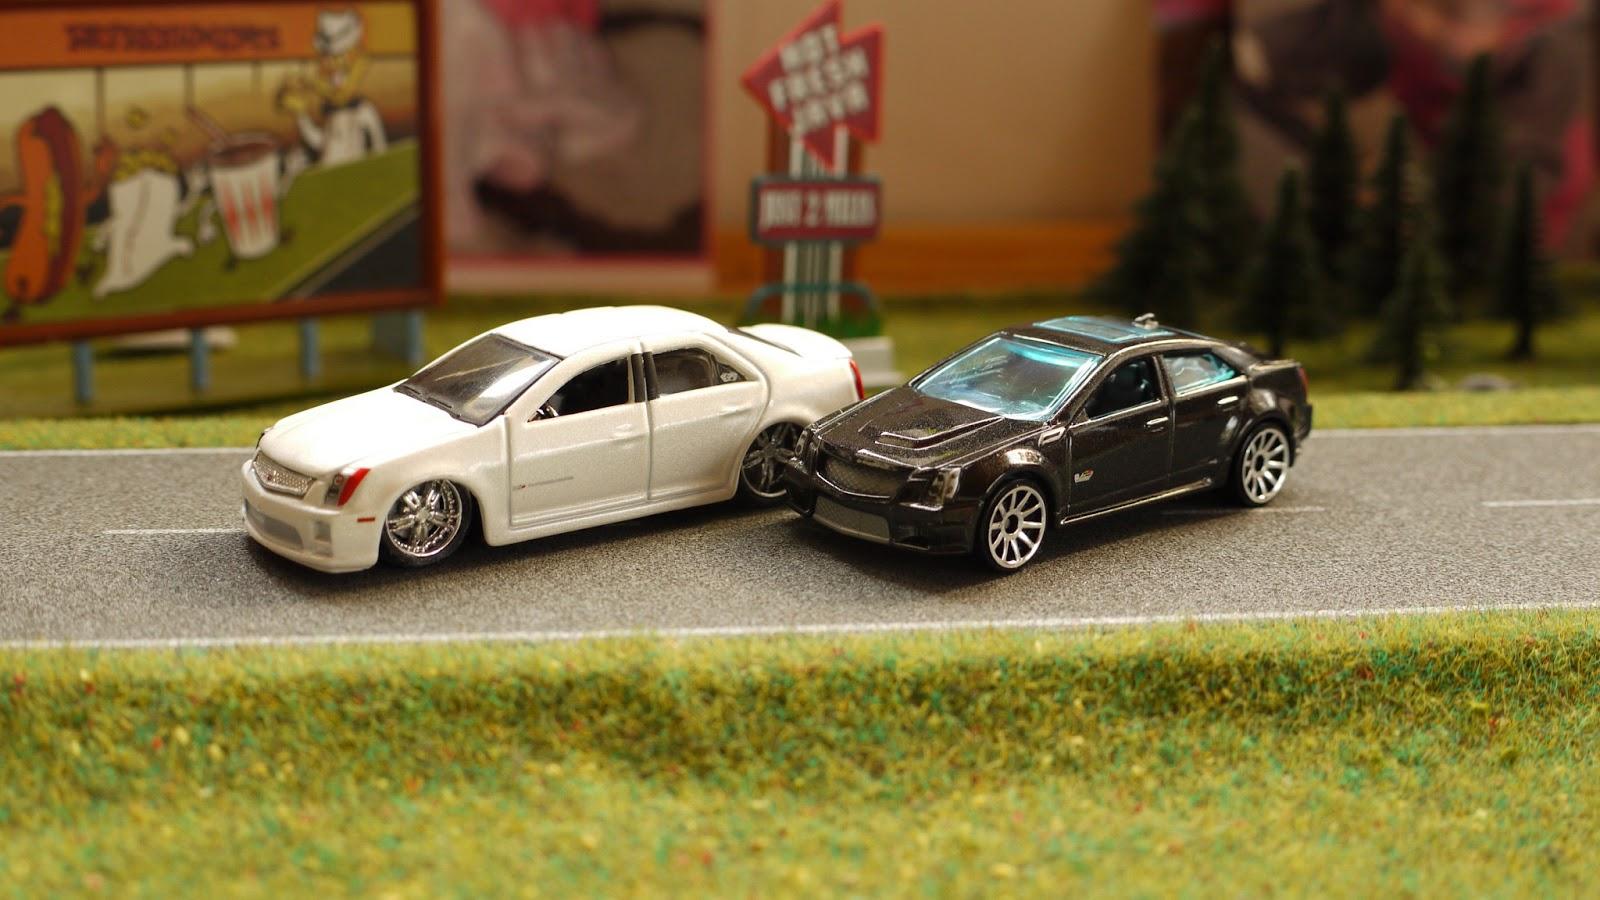 2017 Cadillac Sts >> Diecast cars 1/64, Modellautos 1:64, Modellbilar 1:64